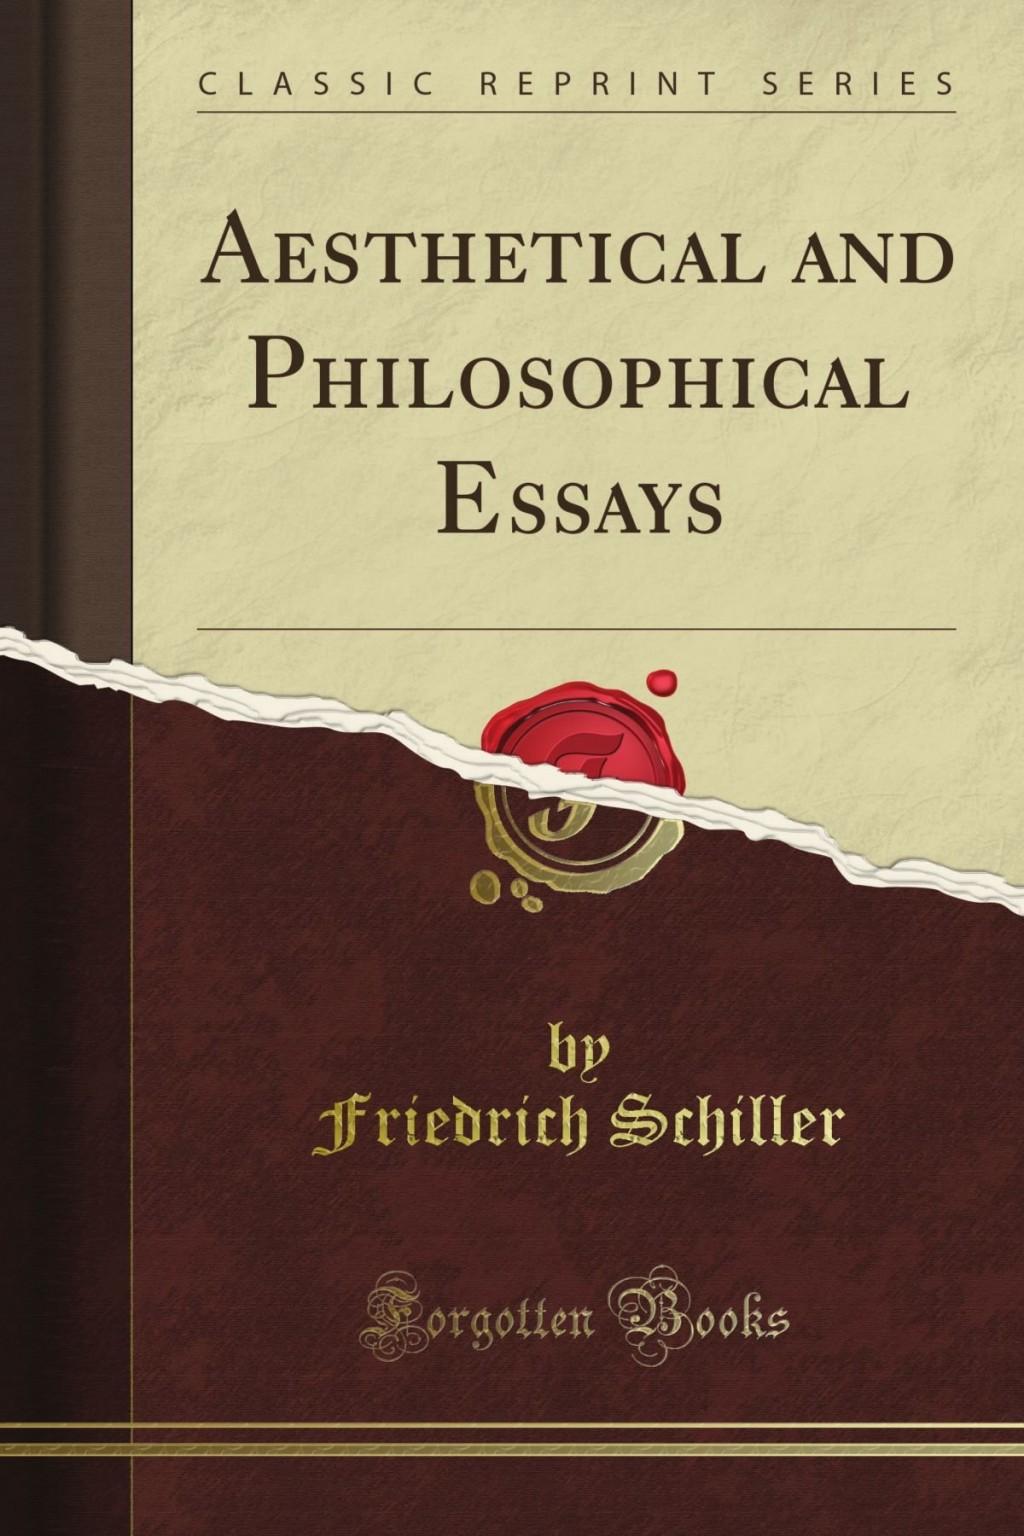 003 81x1hm6n5ol Essay Example Schiller Awful Essays Friedrich Large